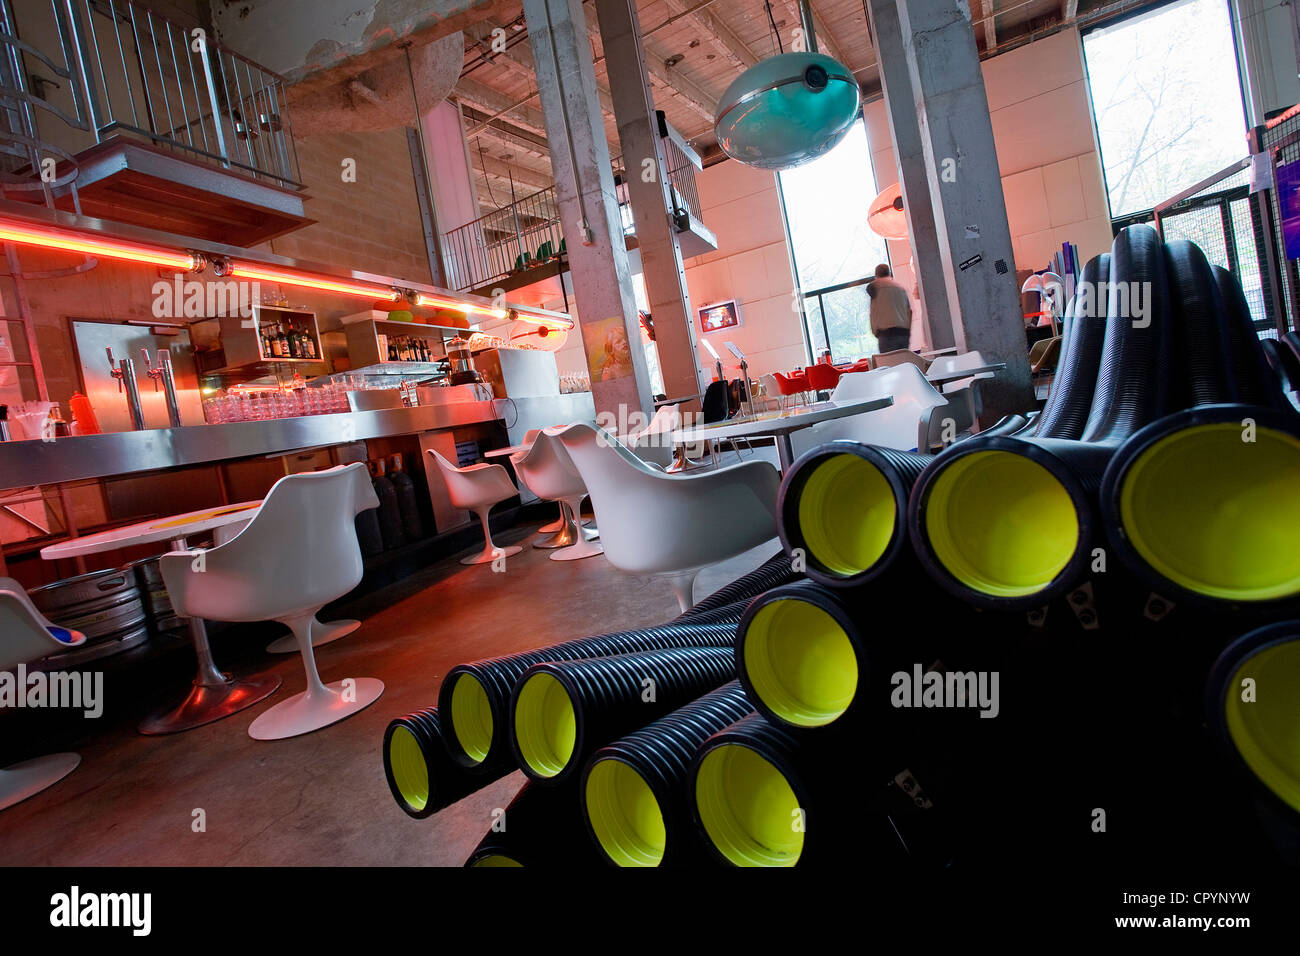 Frankreich, Paris, Palais de Tokyo, Tokyo Eat Restaurant Stockbild